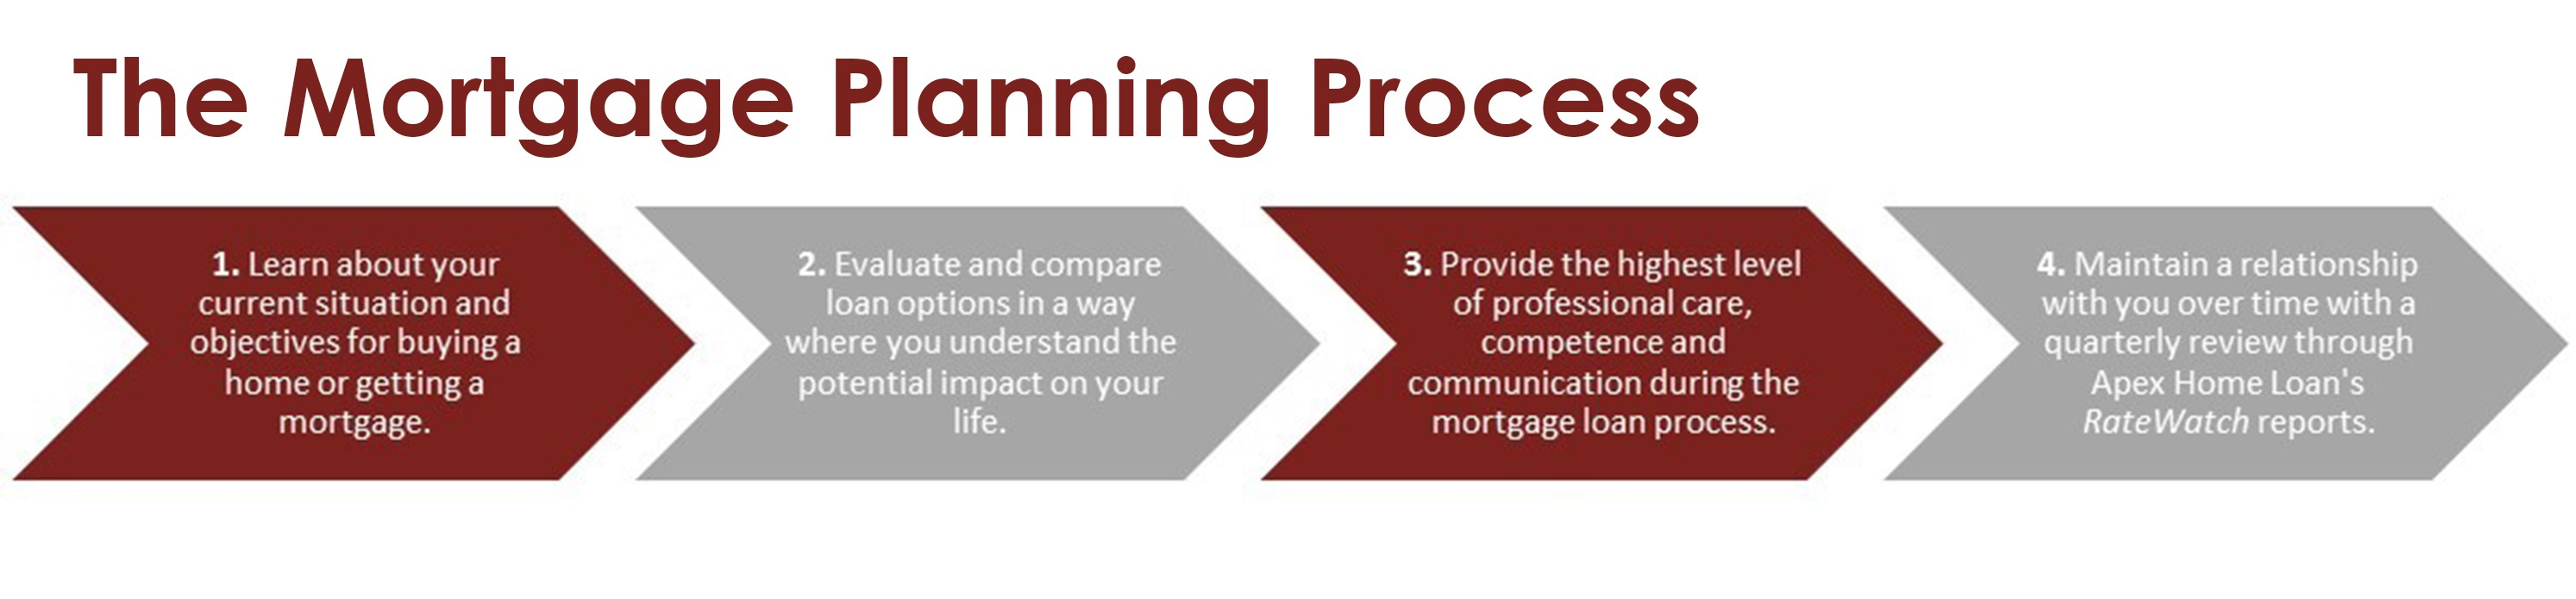 mortgage_planning_chevron 1jpg